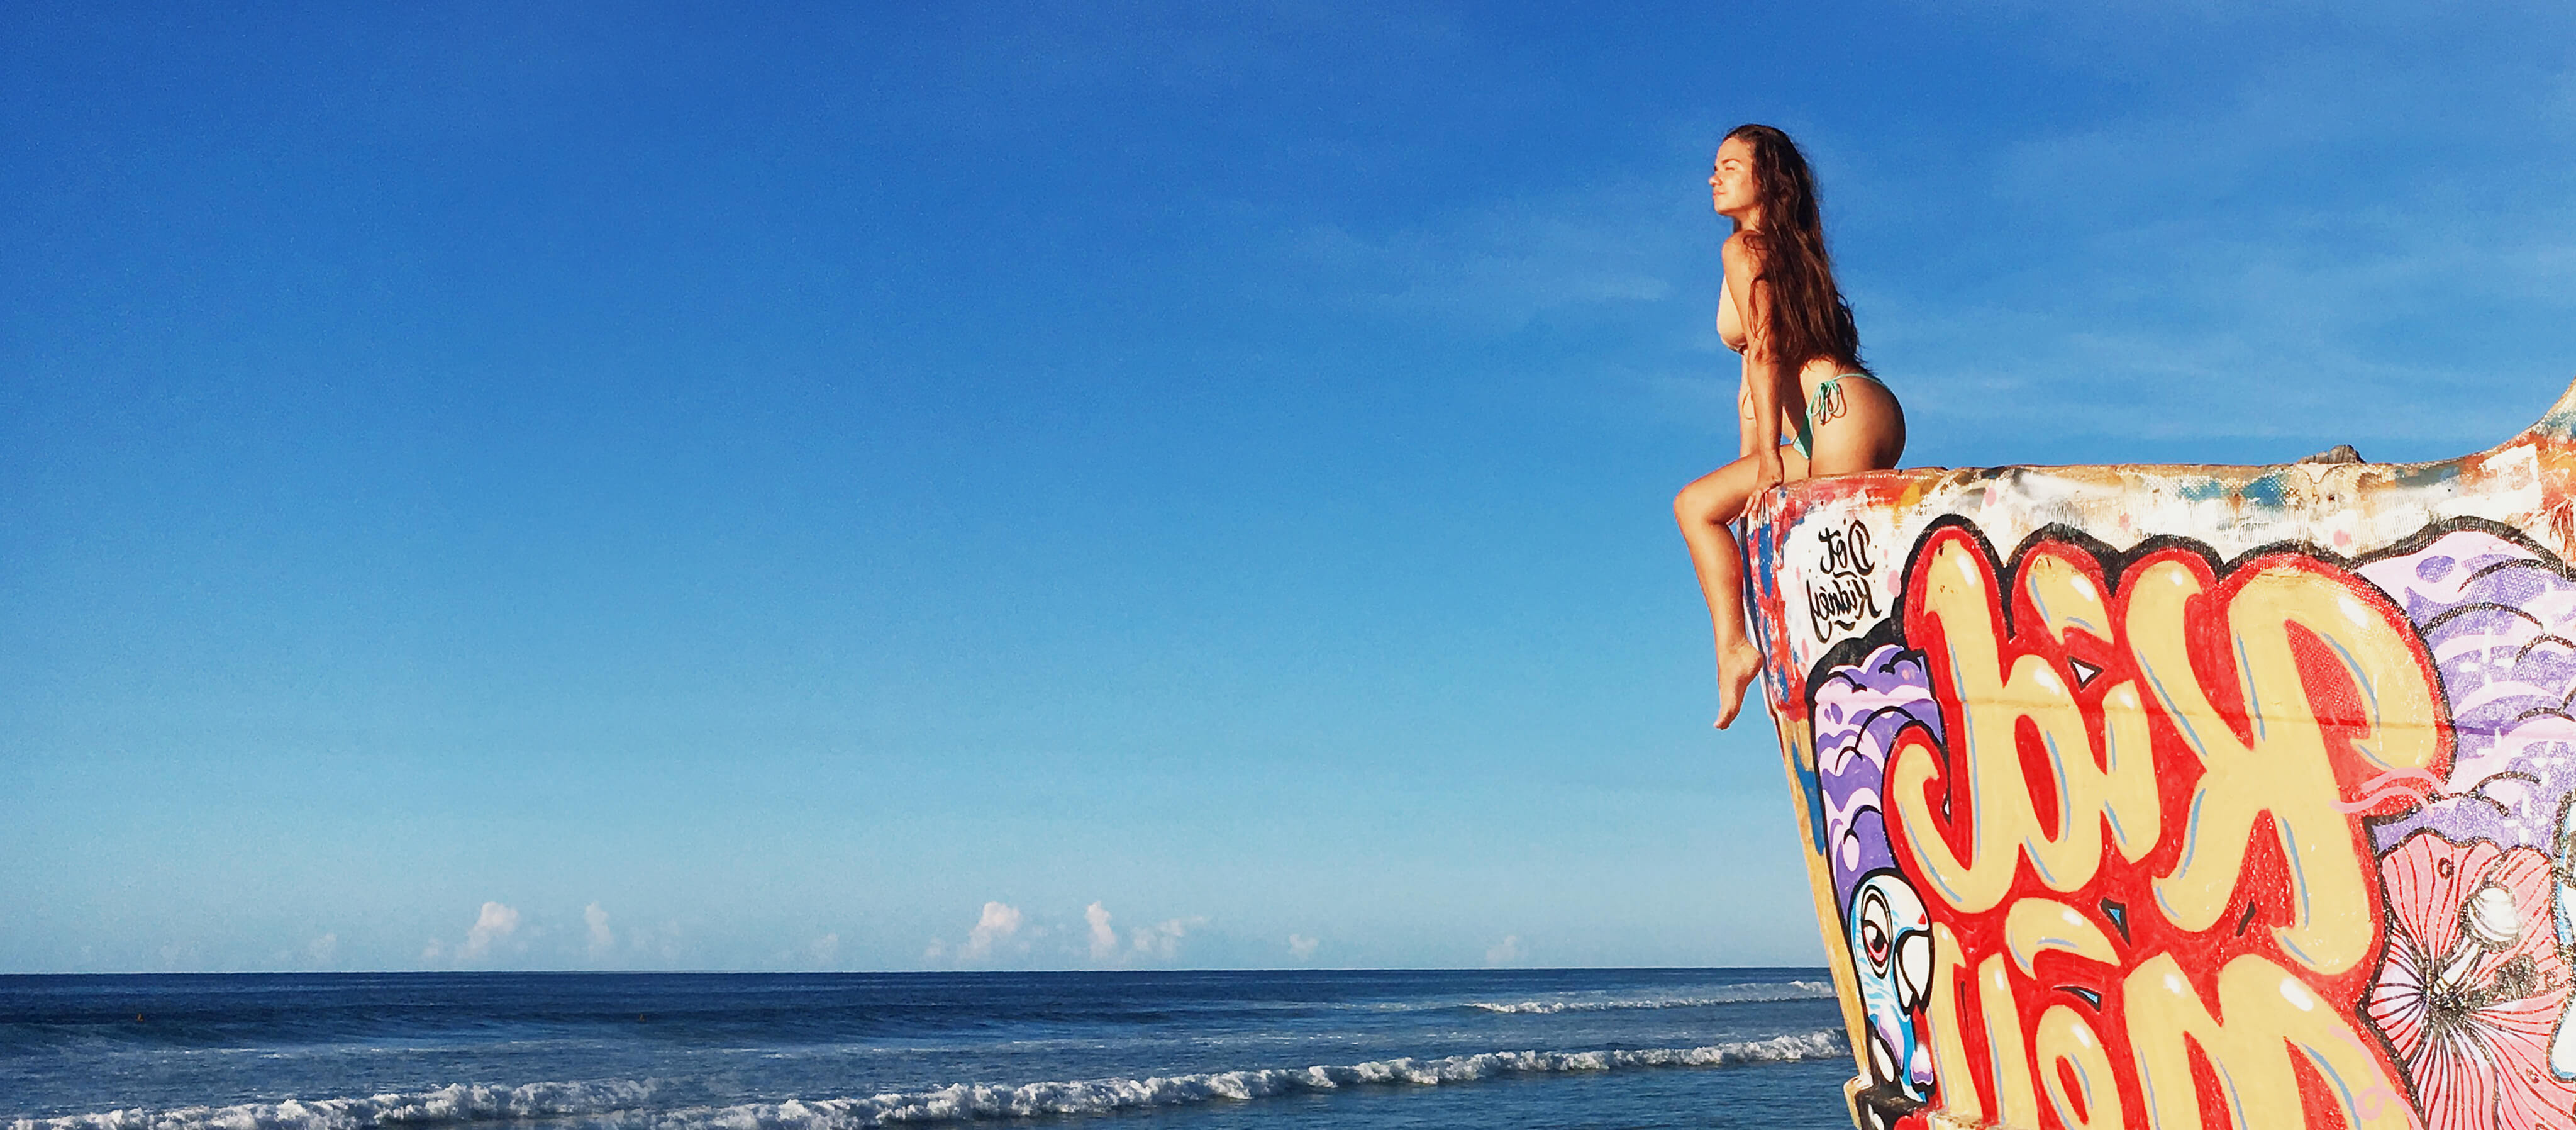 Bali, Bukit, Cliff, beach, ocean, waves, Nyang nyang, Бали, Букит, утес, океан, пляж, волны, Ньянг Ньянг